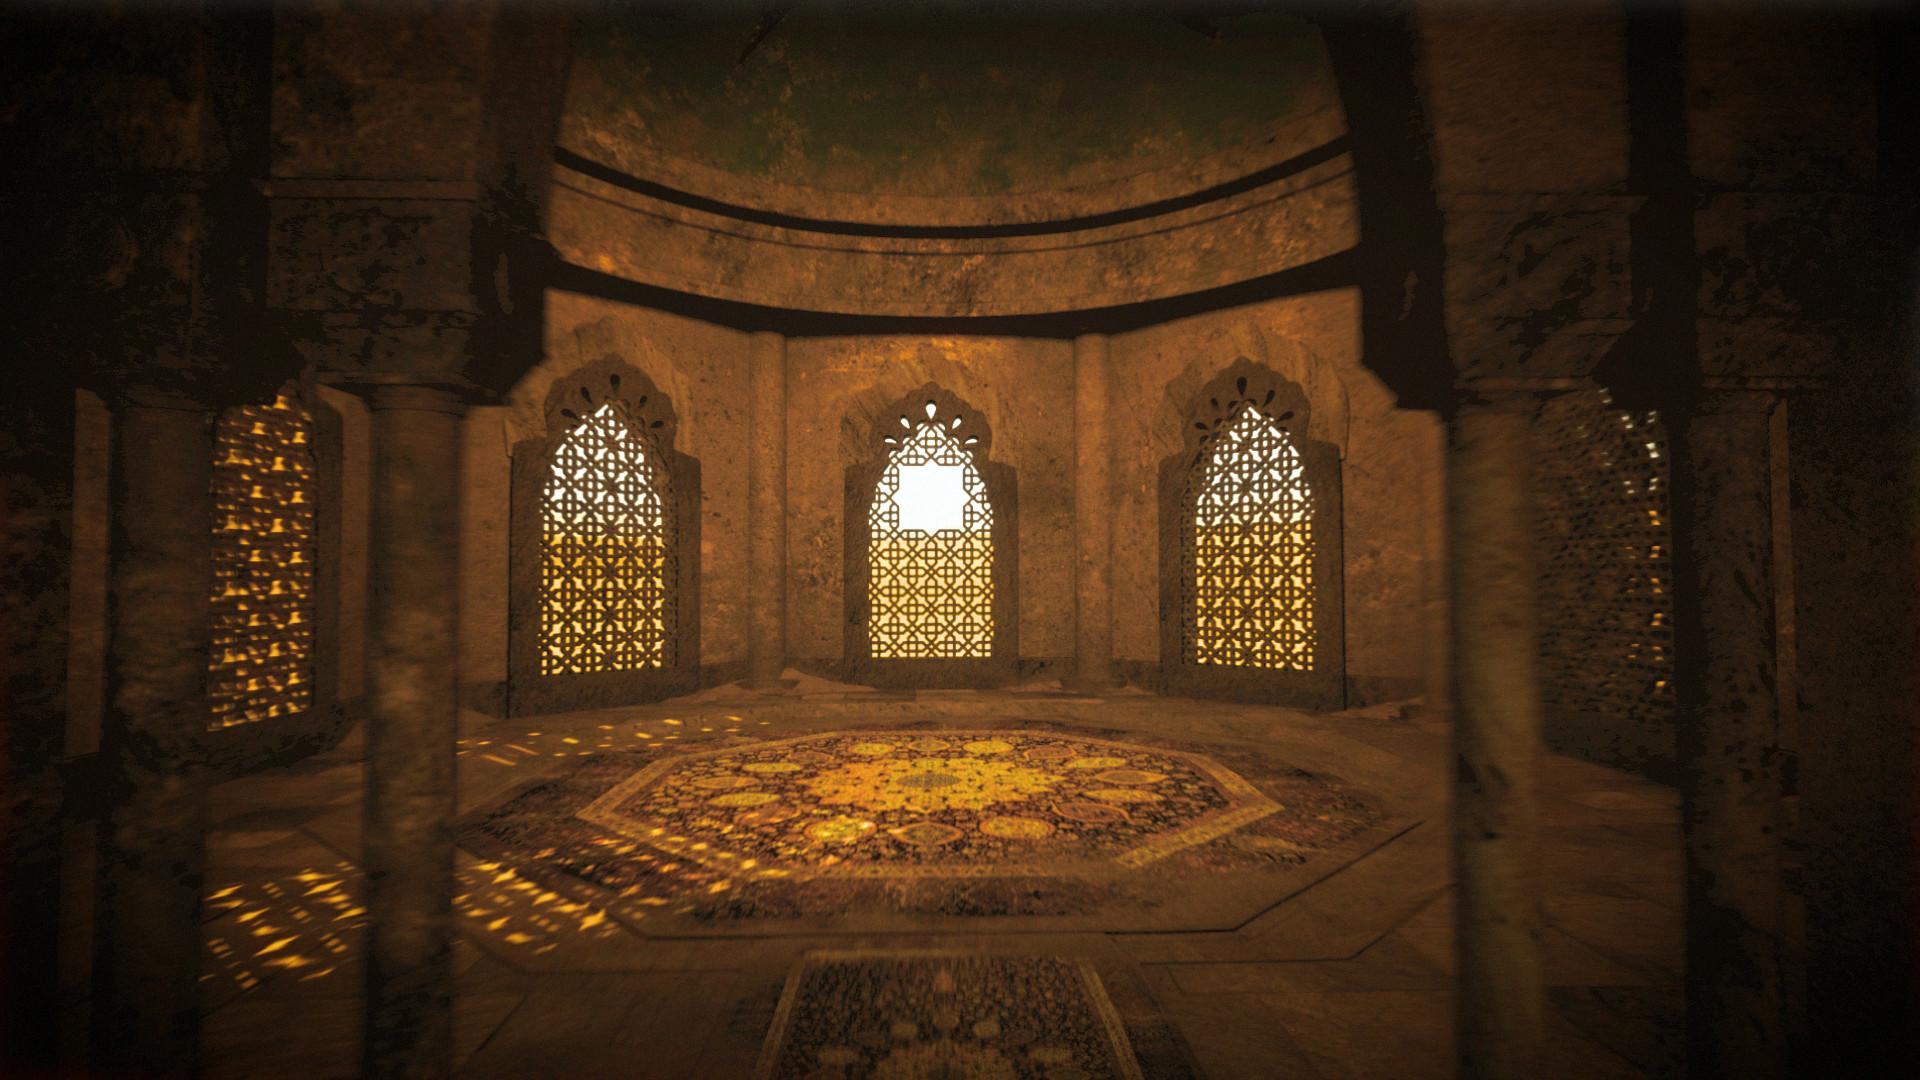 Shariq altaf noa stills 01b